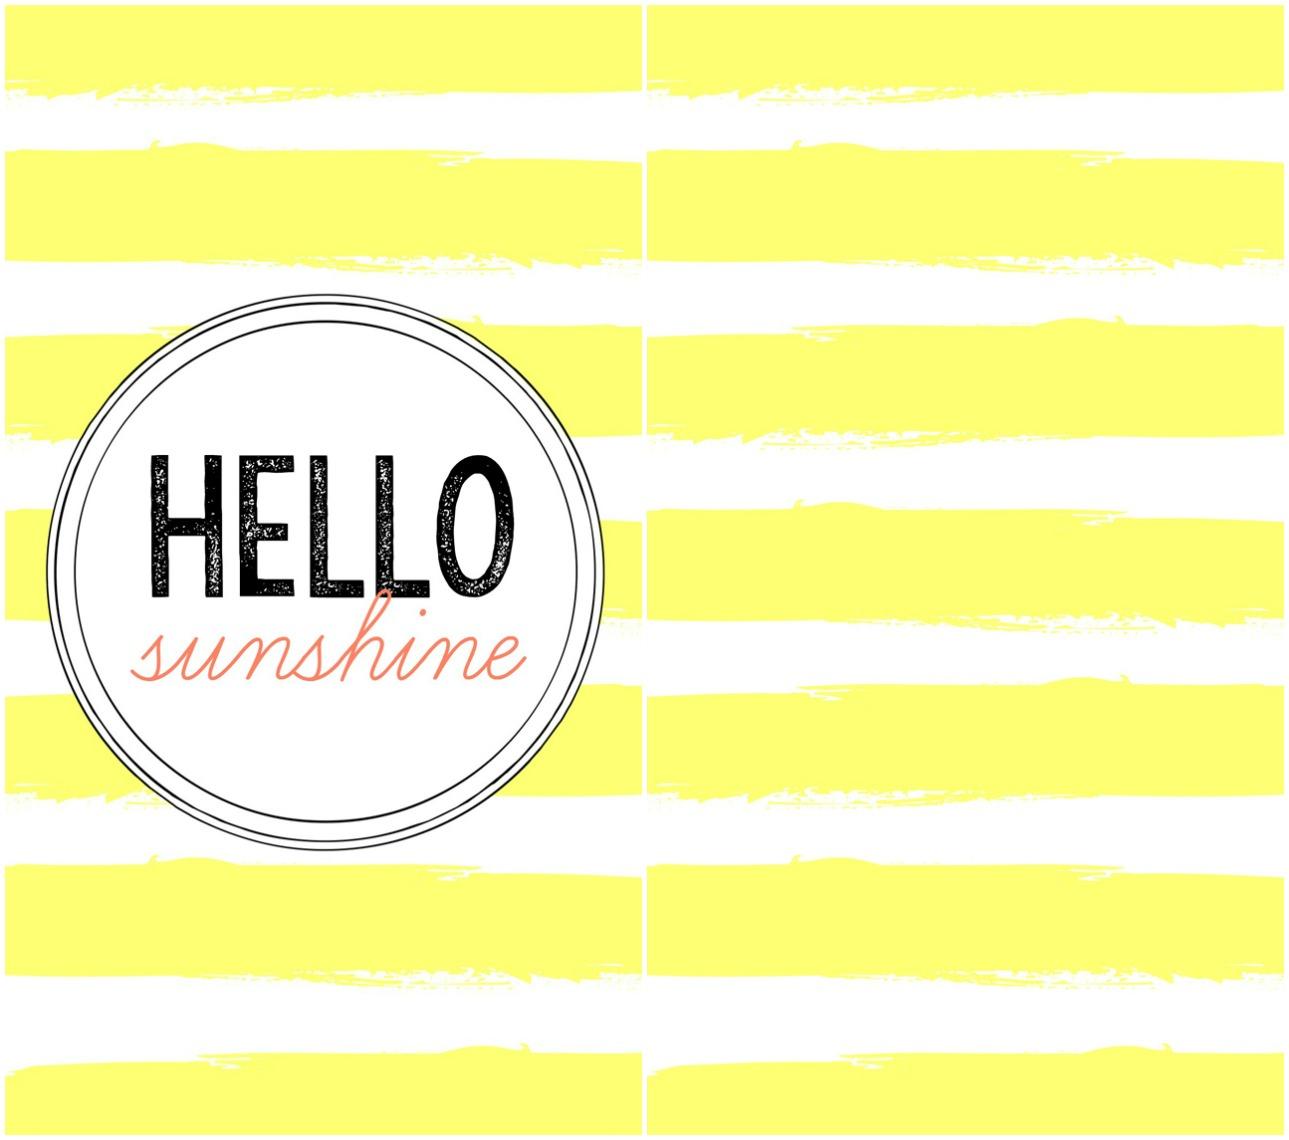 Cute Iphone Wallpaper Ideas Free Summer Phone Wallpapers